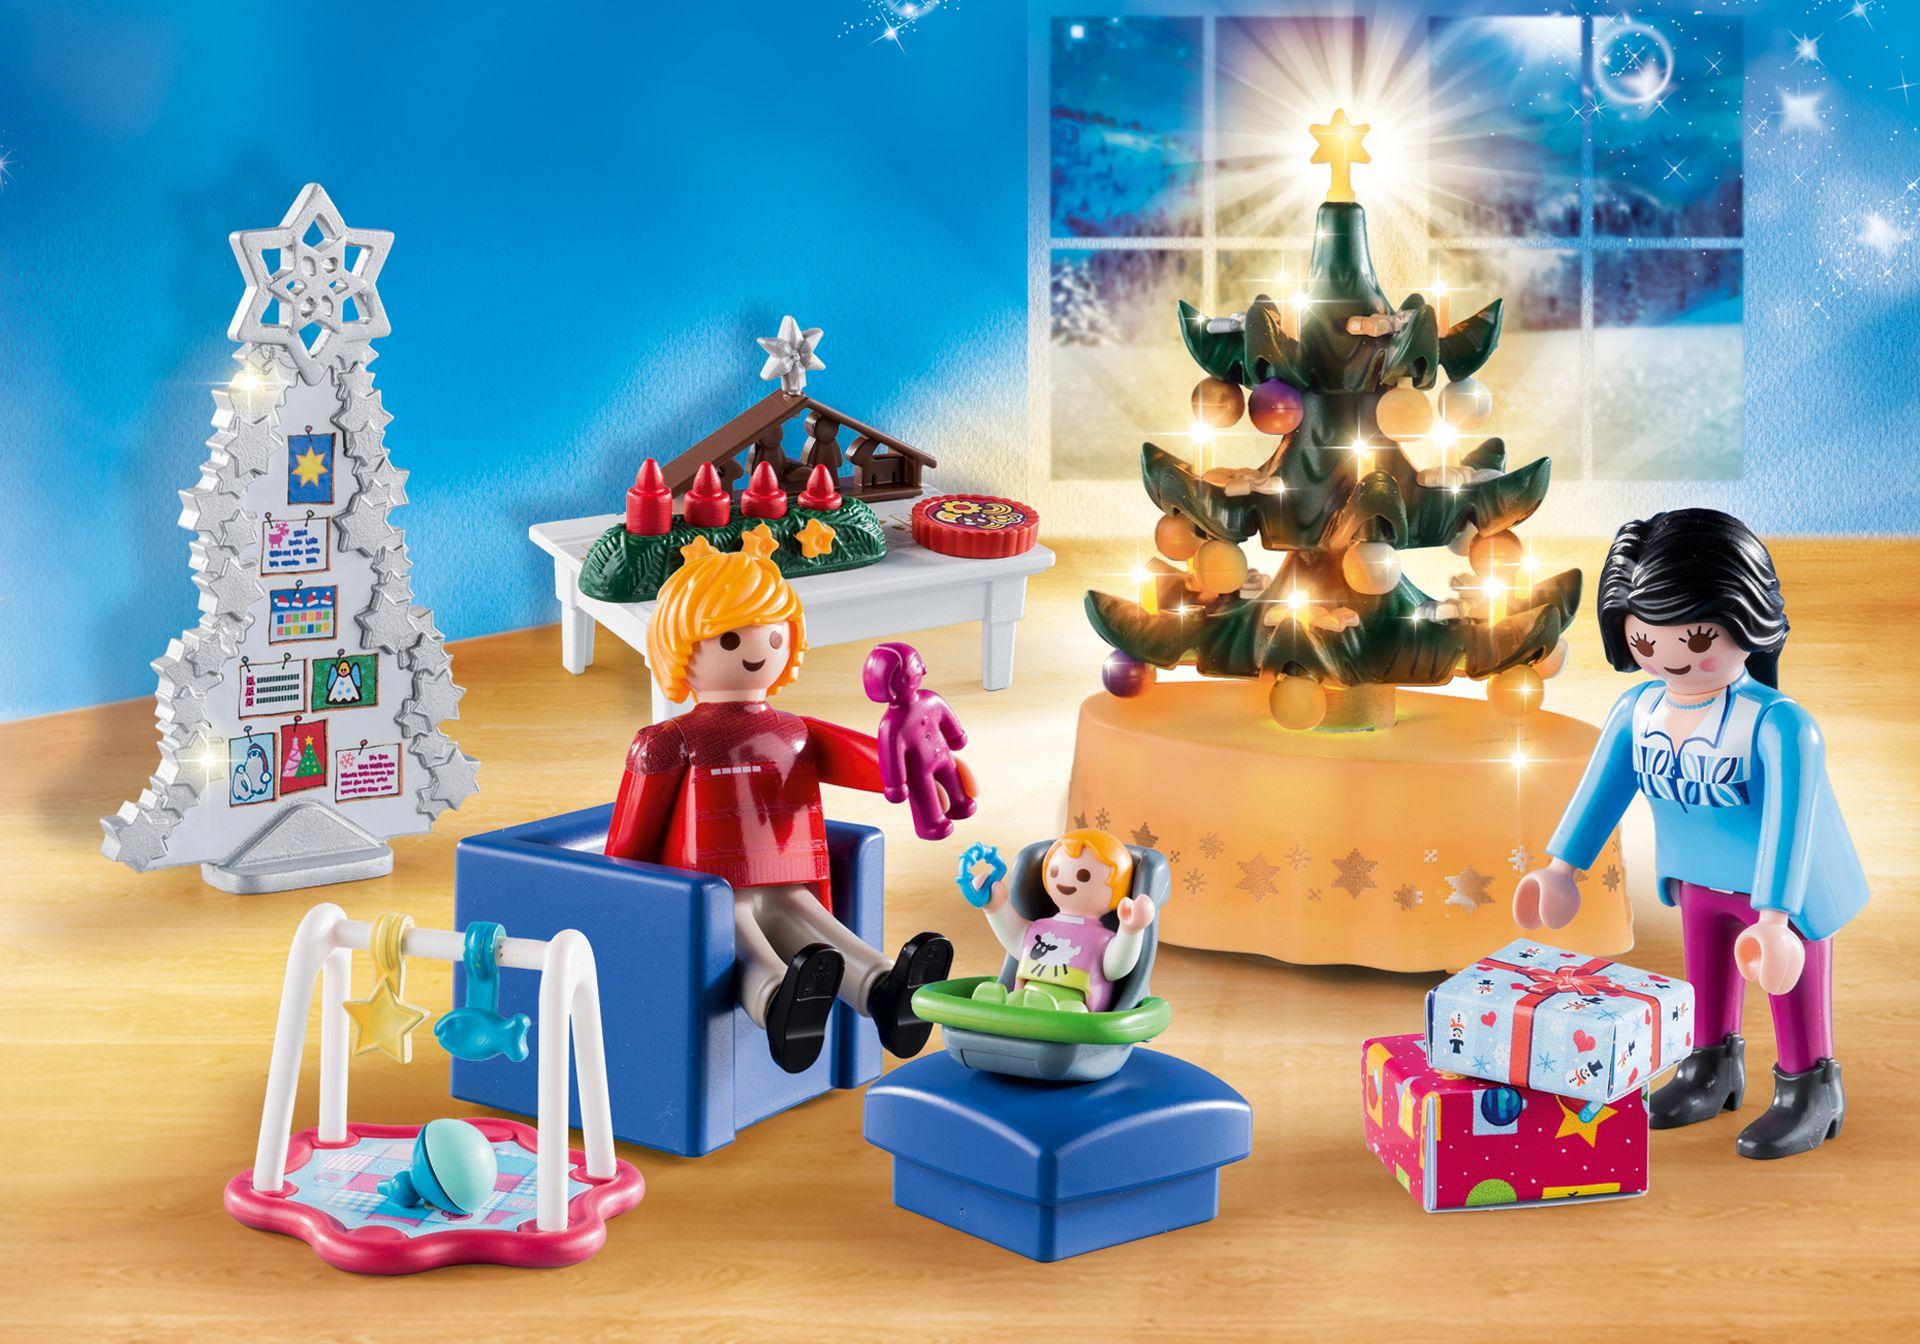 Playmobil Noël ref 35